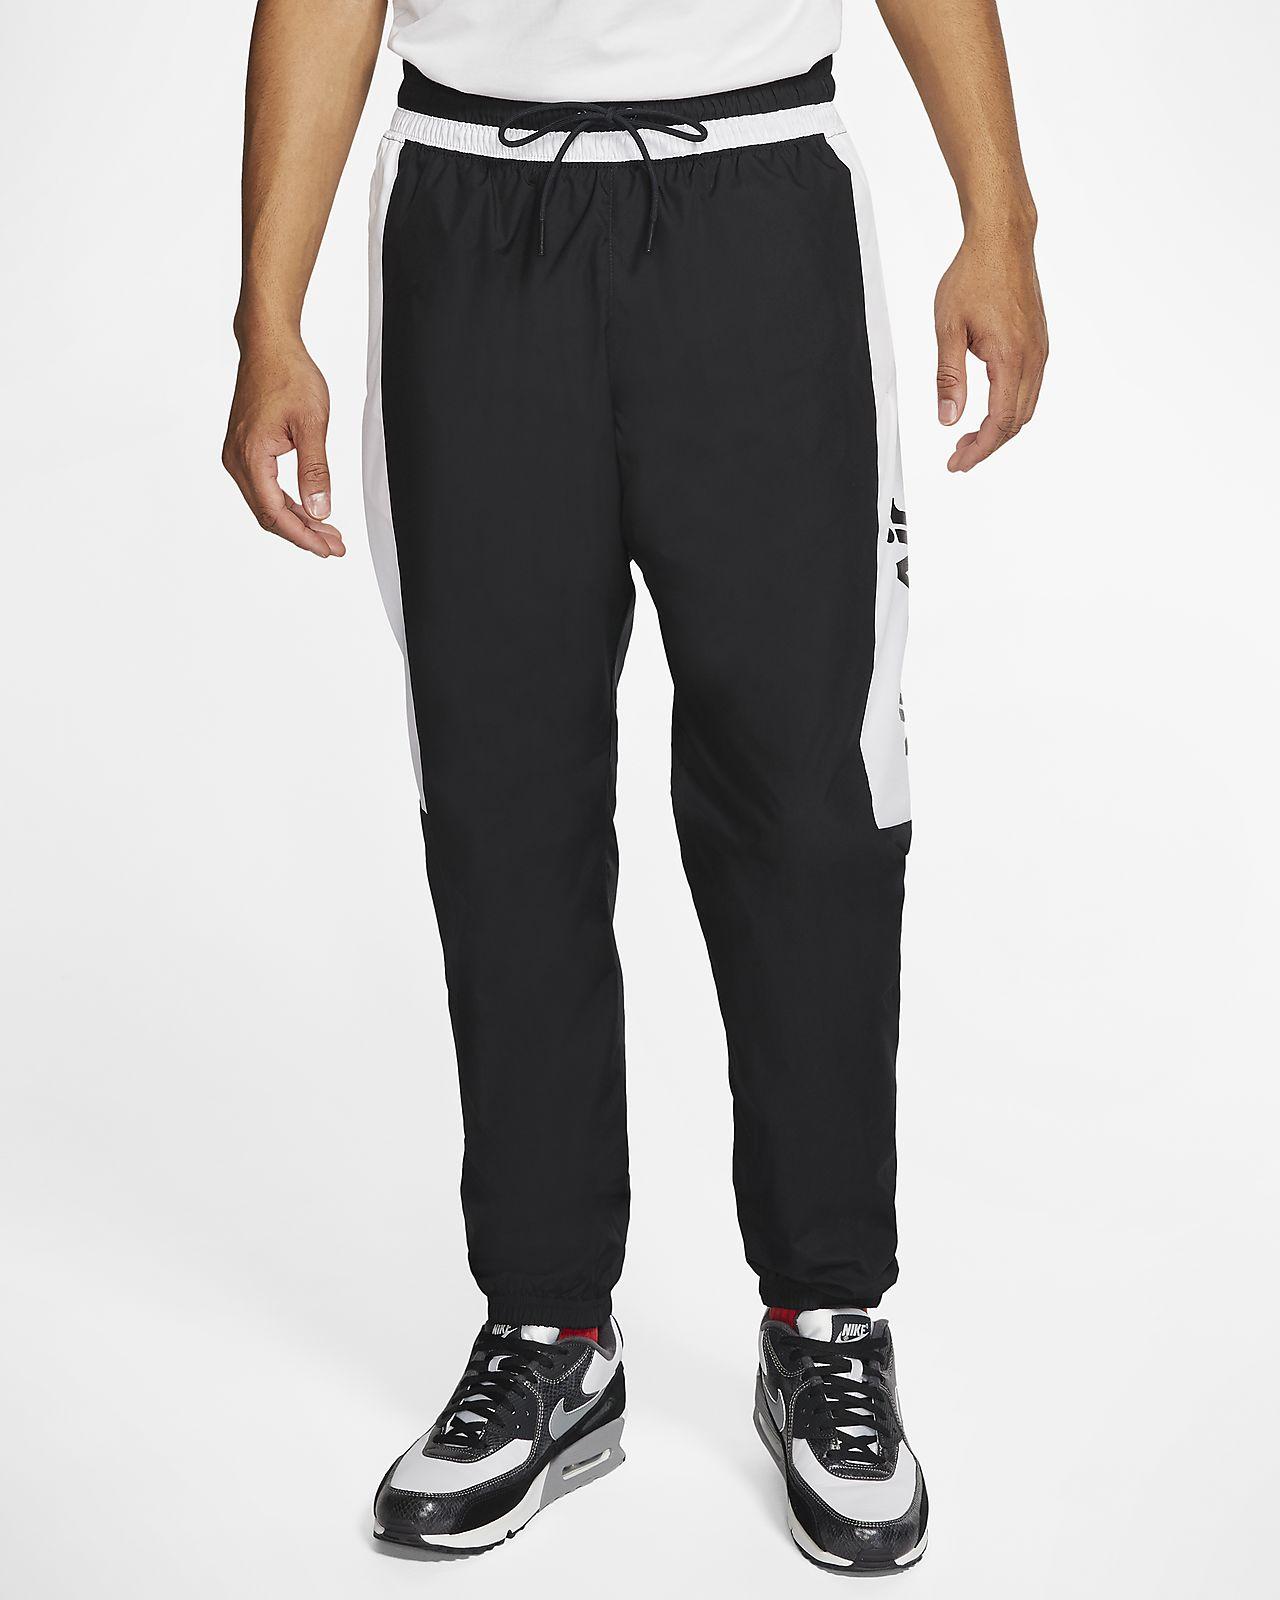 Byxor Nike Air för ungdom